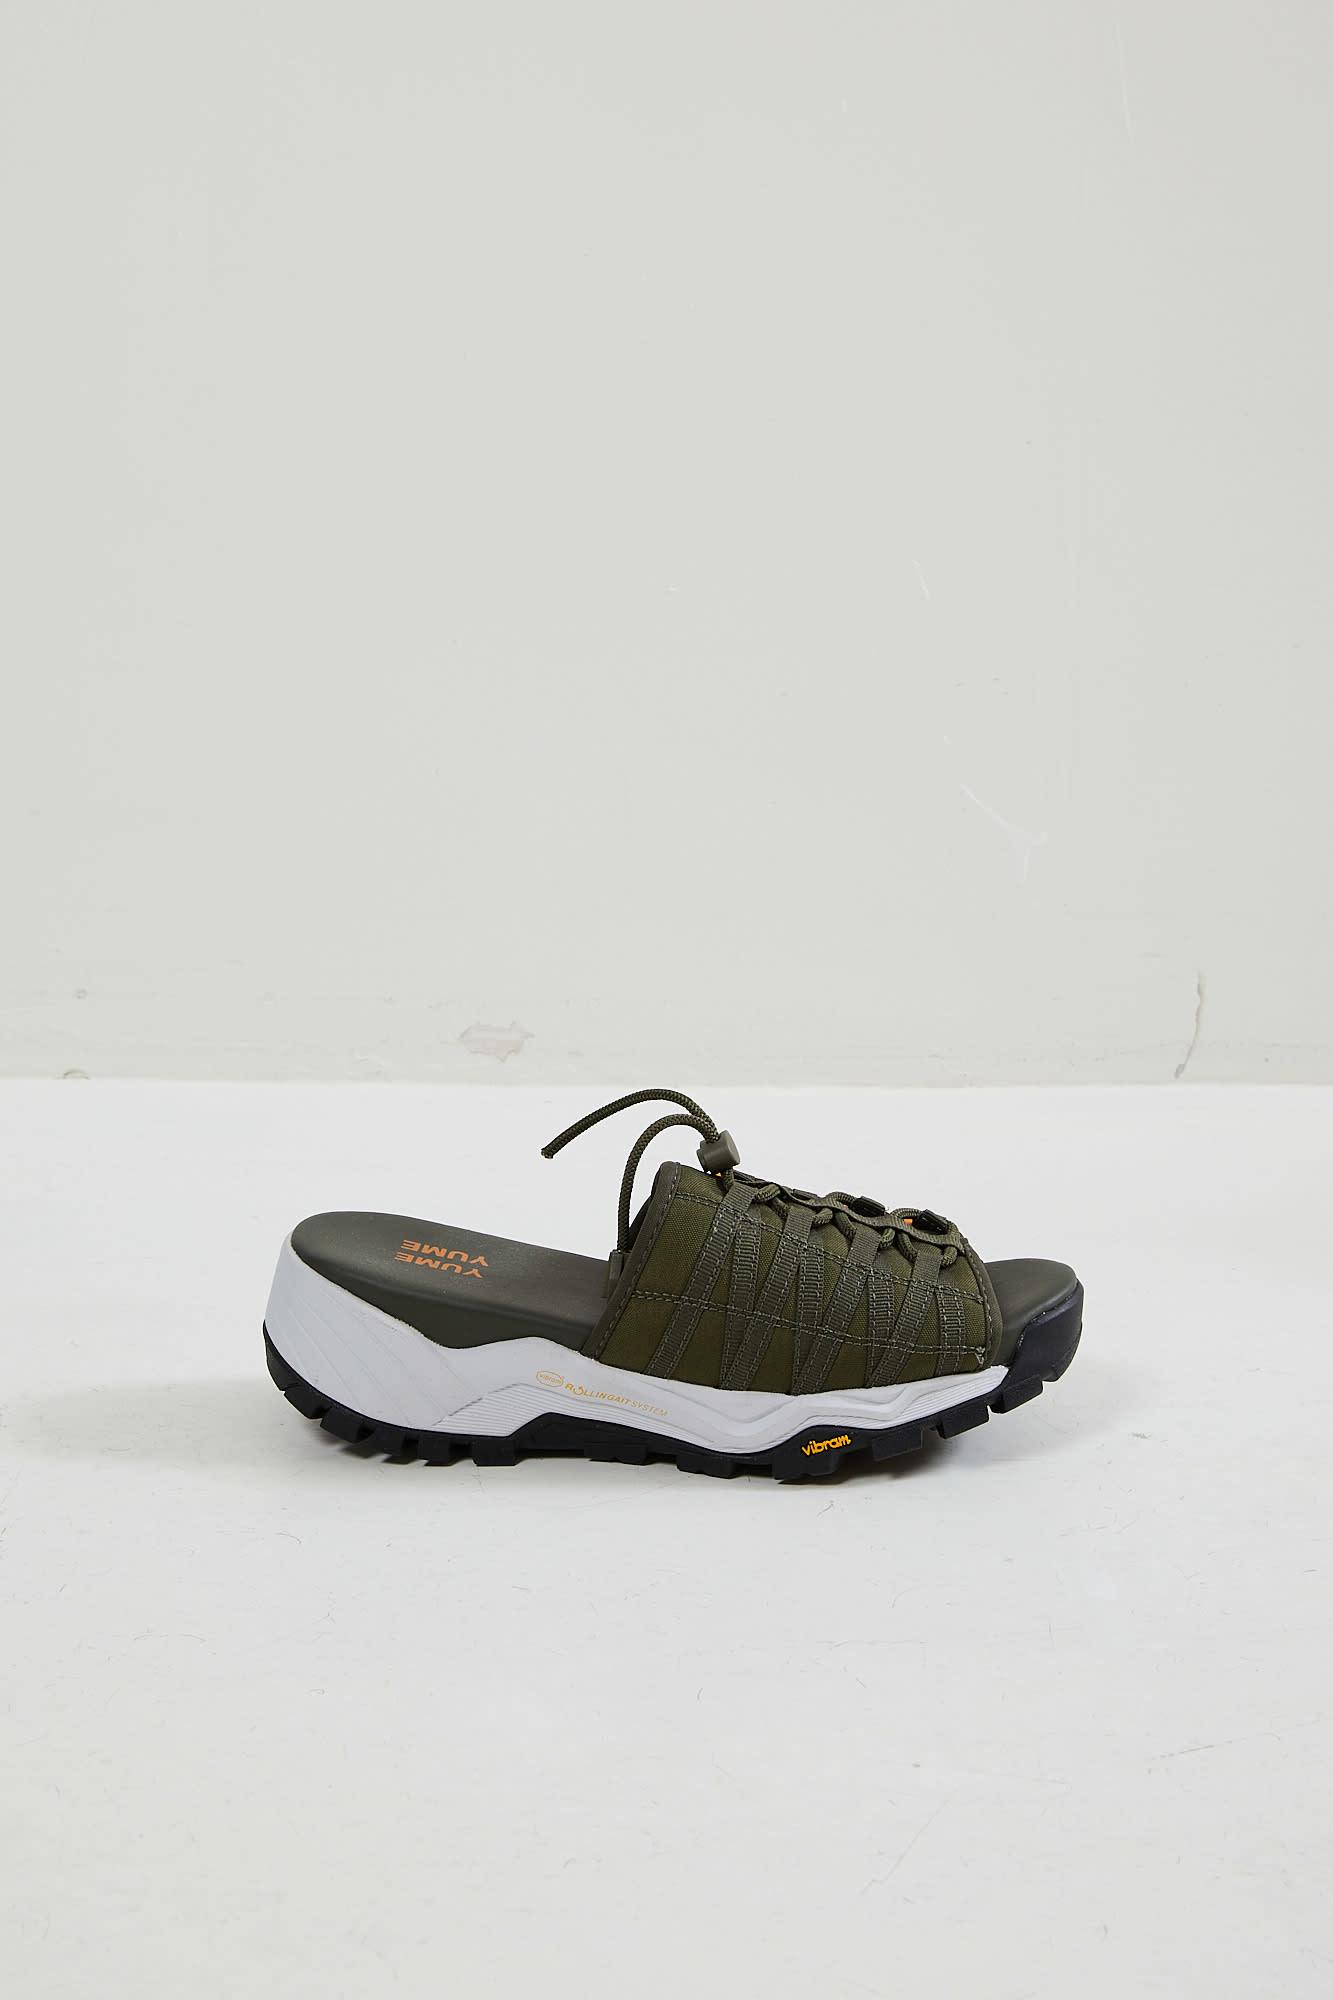 Yume Yume - mount kita vibram sole slippers